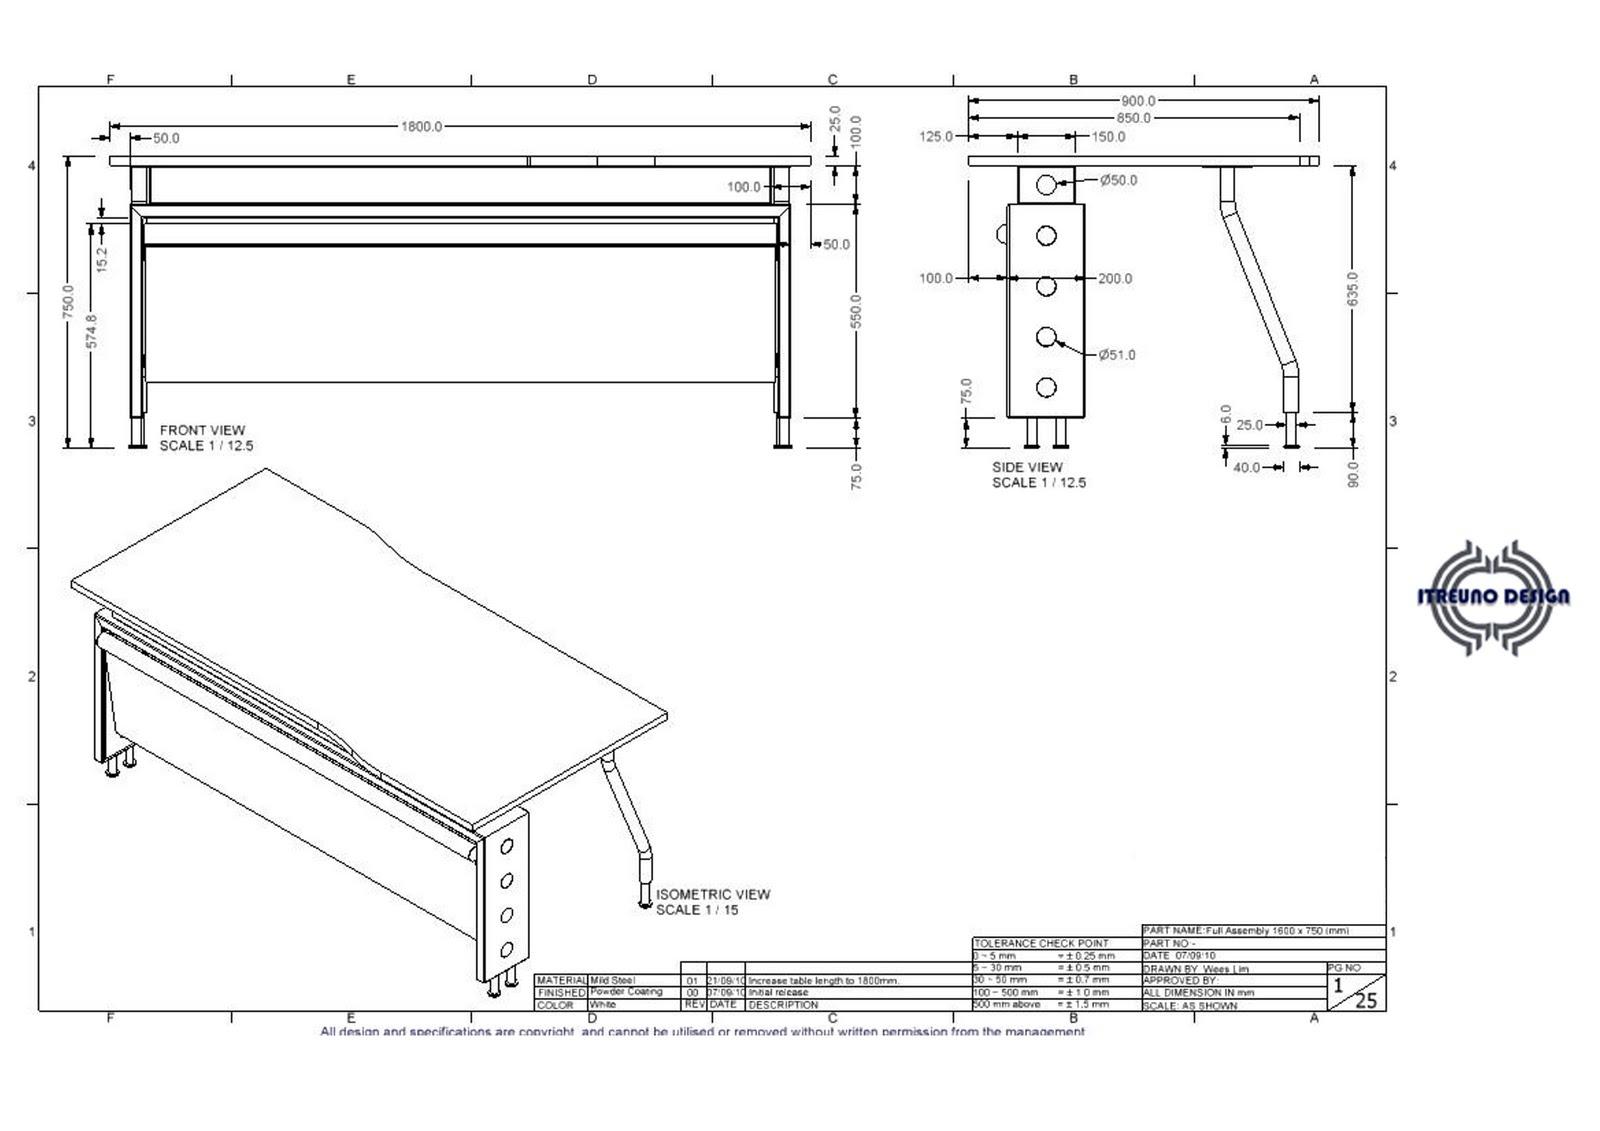 Itreuno Design Sc Office Table